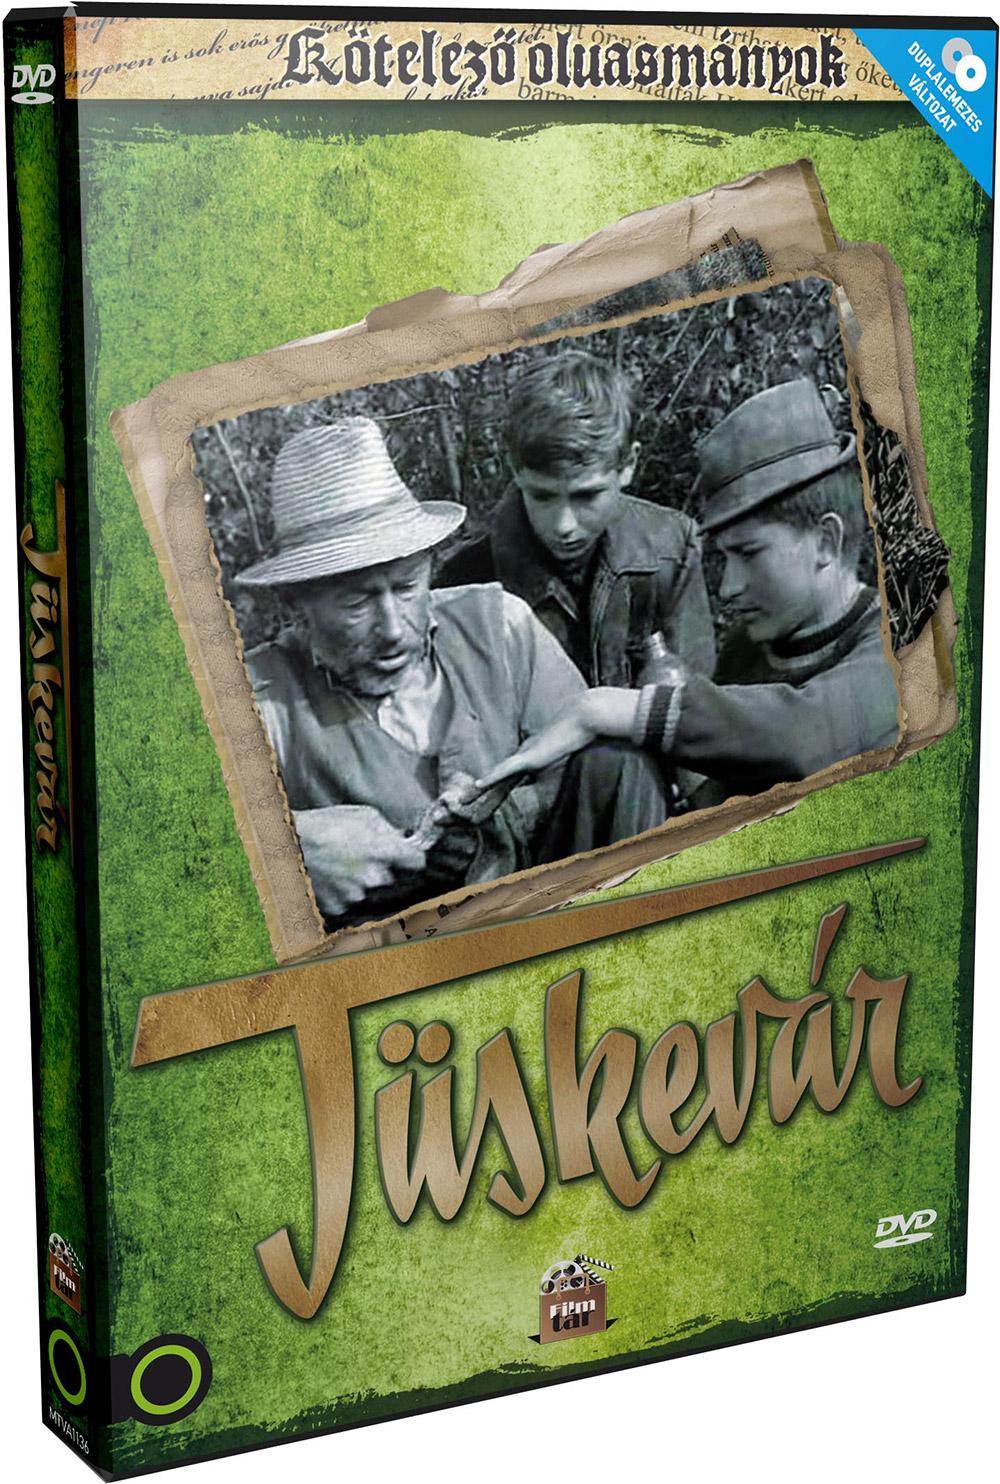 T�skev�r DVD